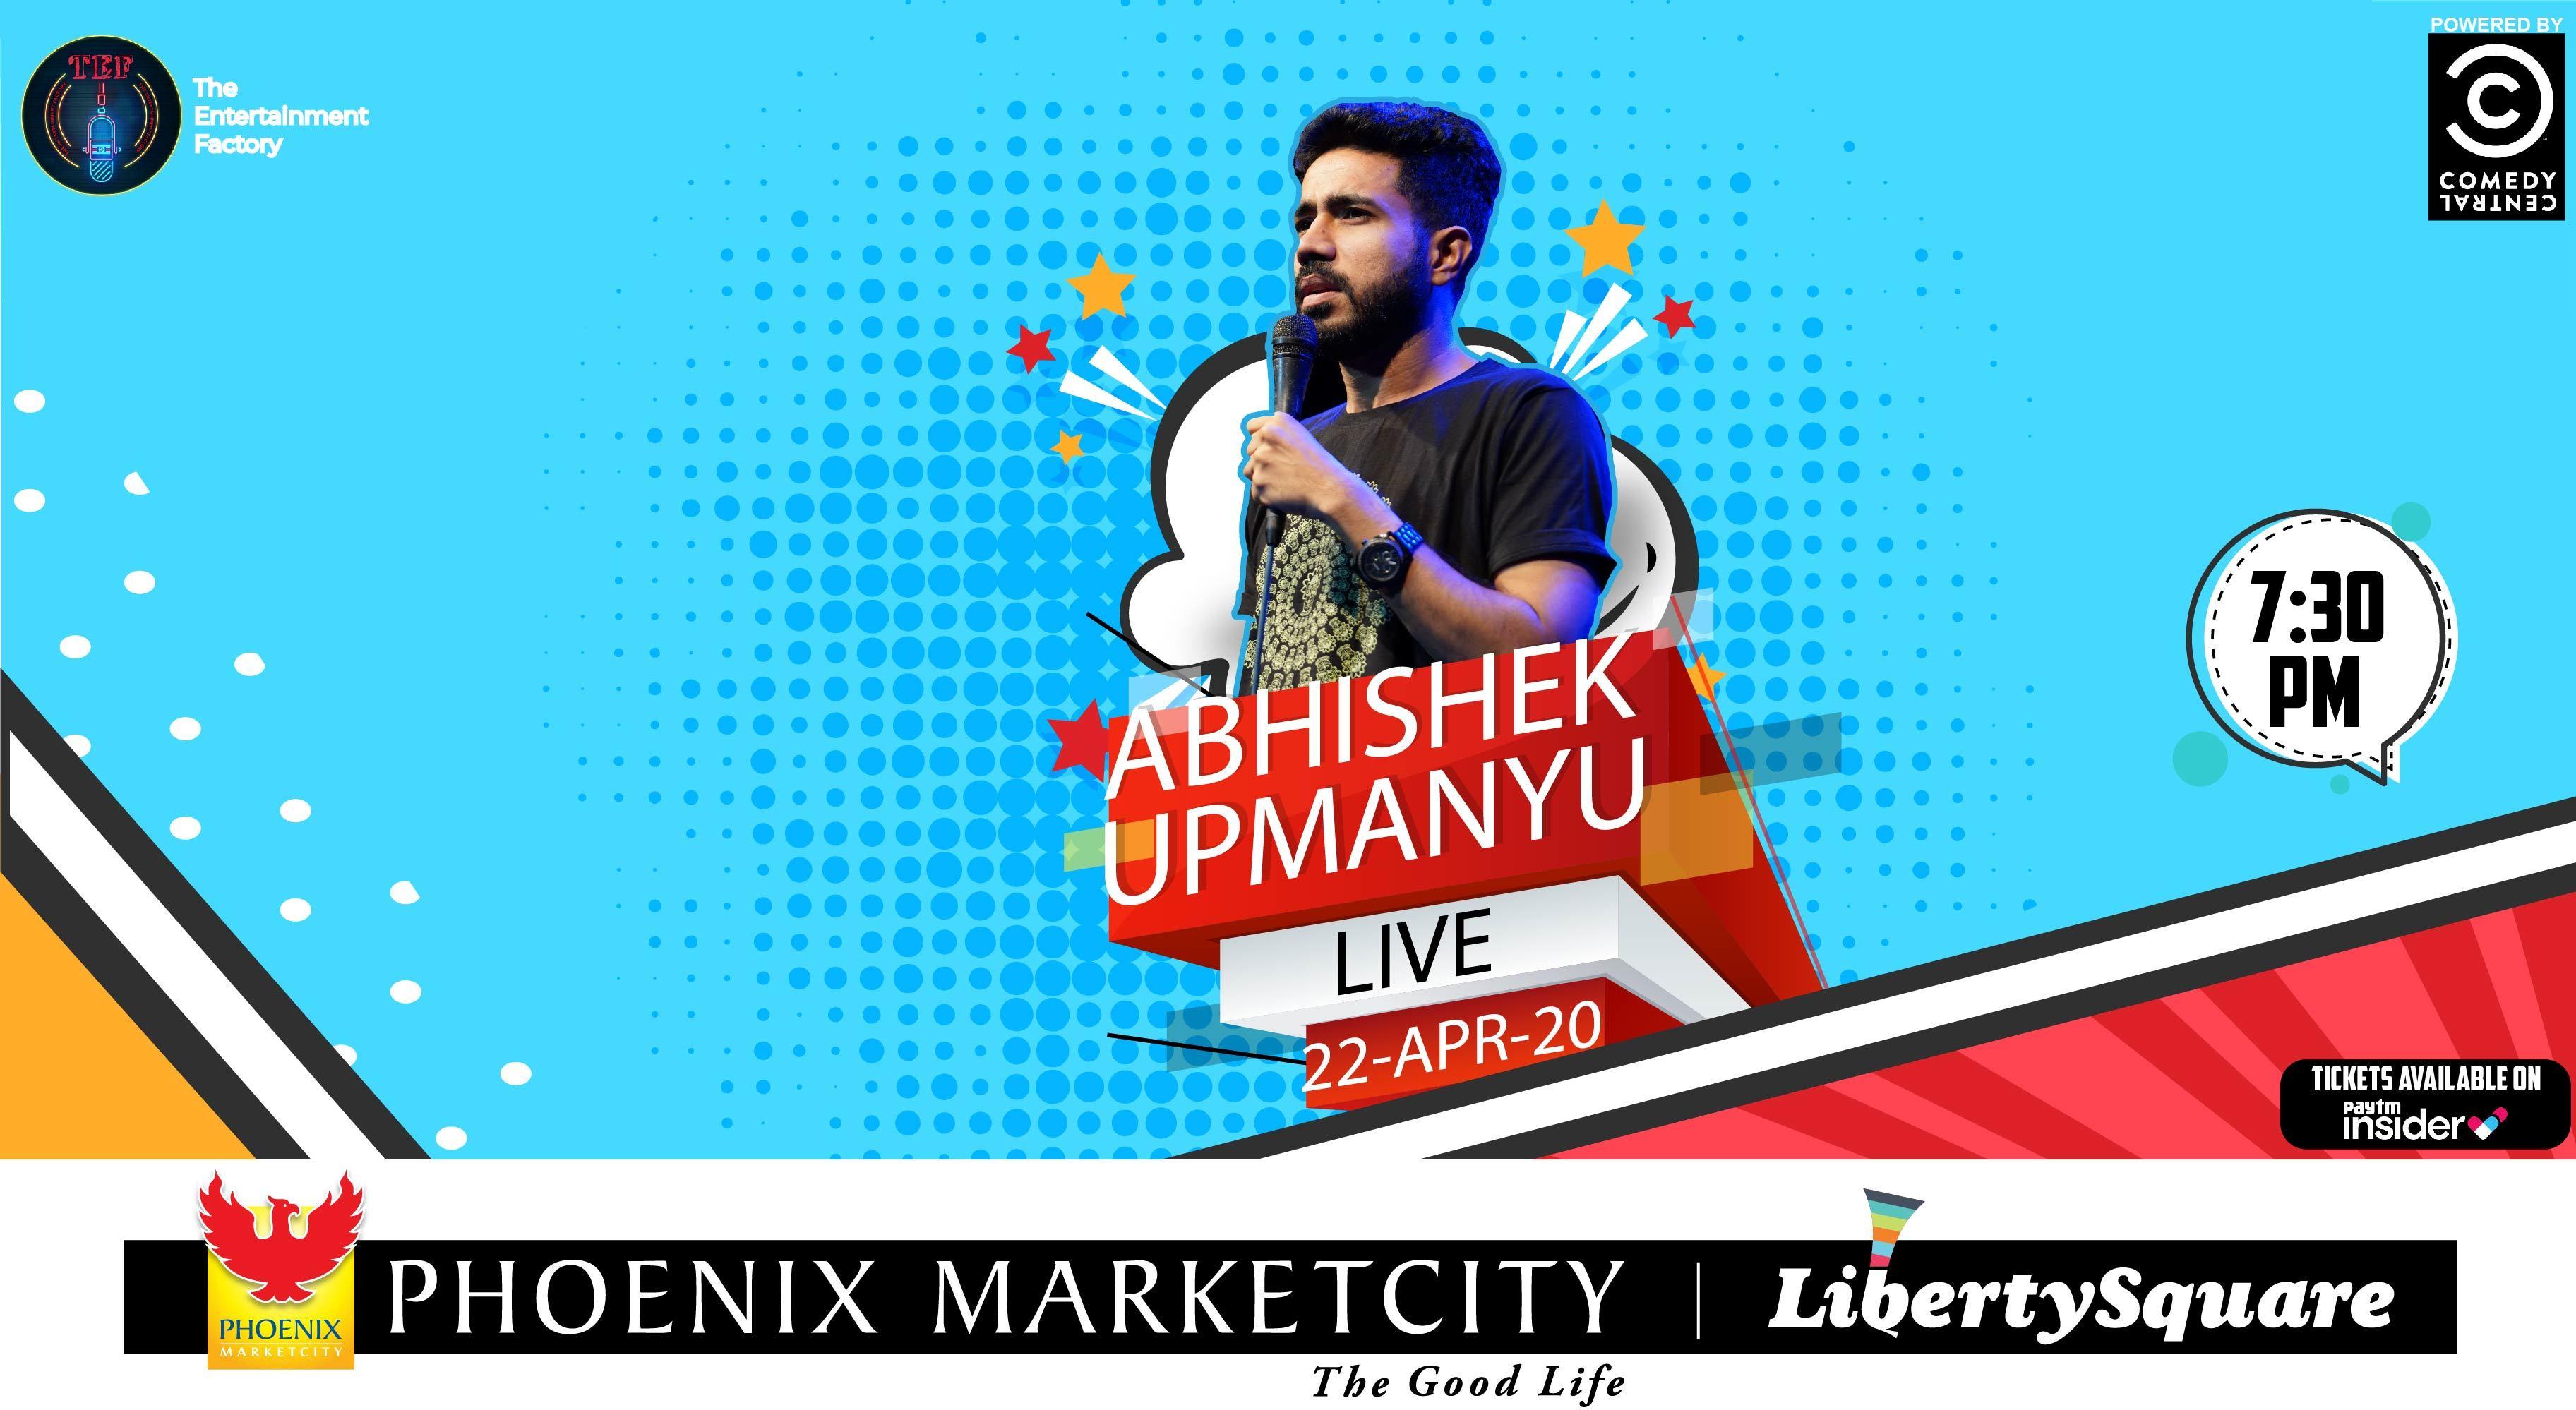 Abhishek Upmanyu Live | Pune